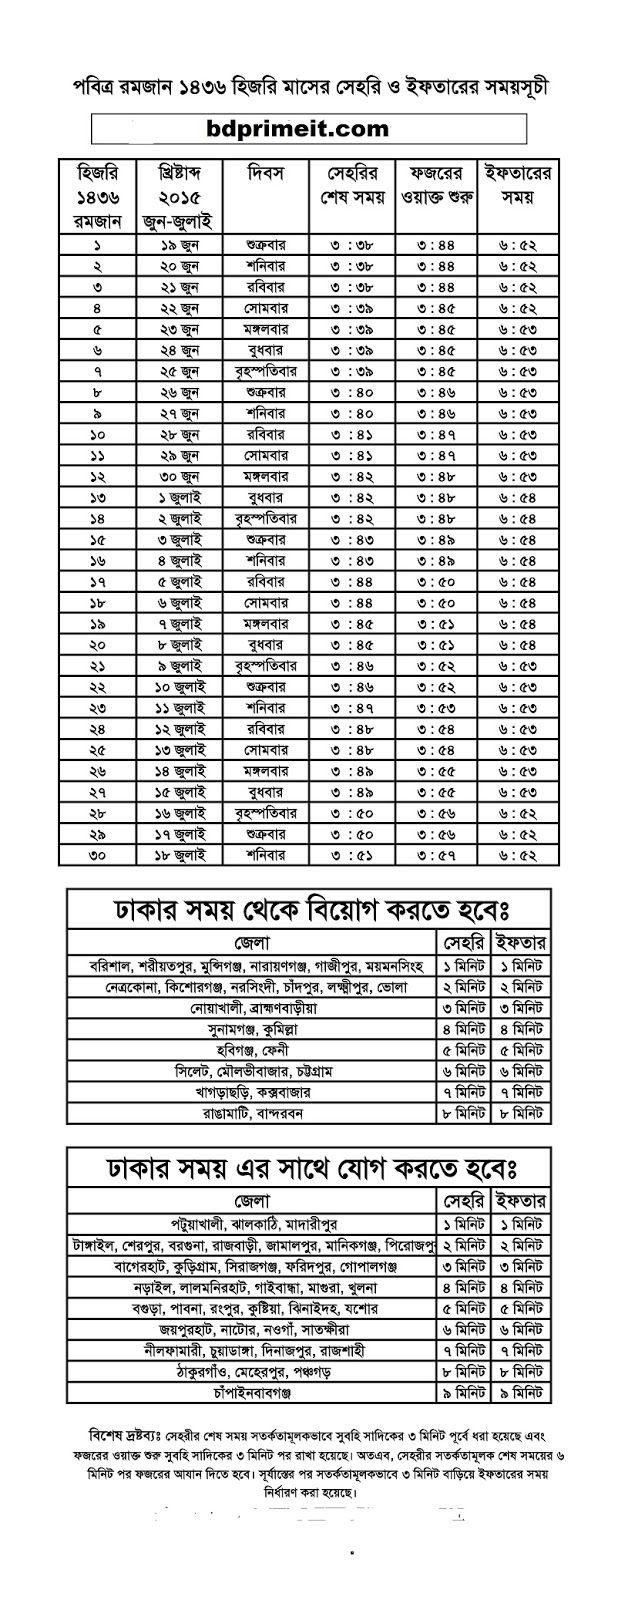 Ramadan calendar 2019 in Bangladesh - Islamic Foundation